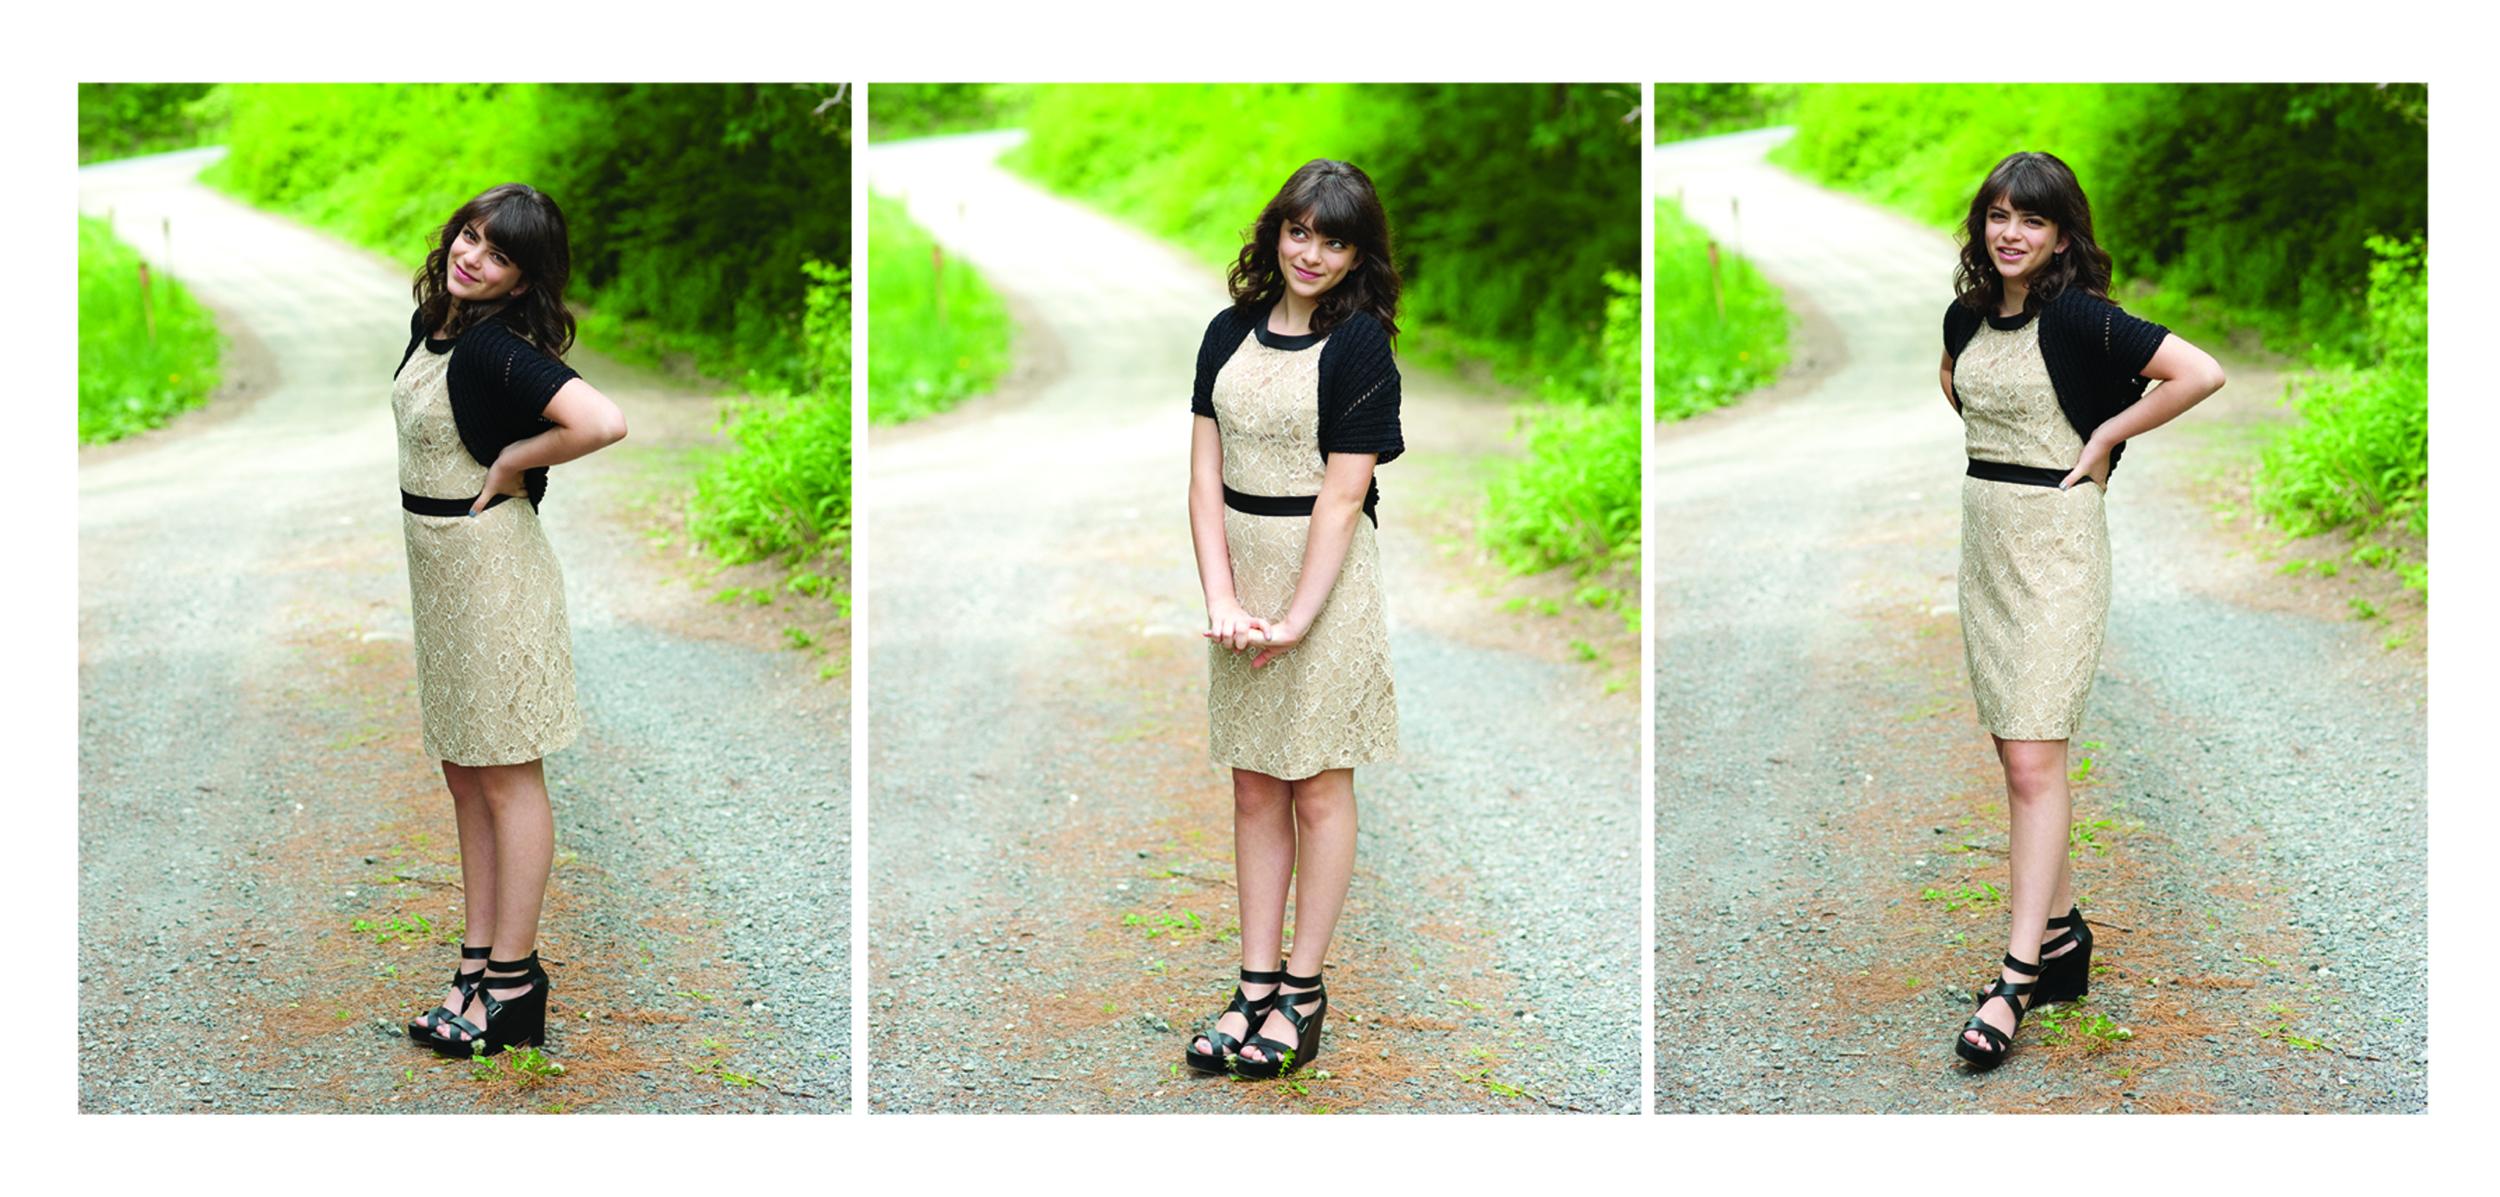 triptych.nostroke.jpg